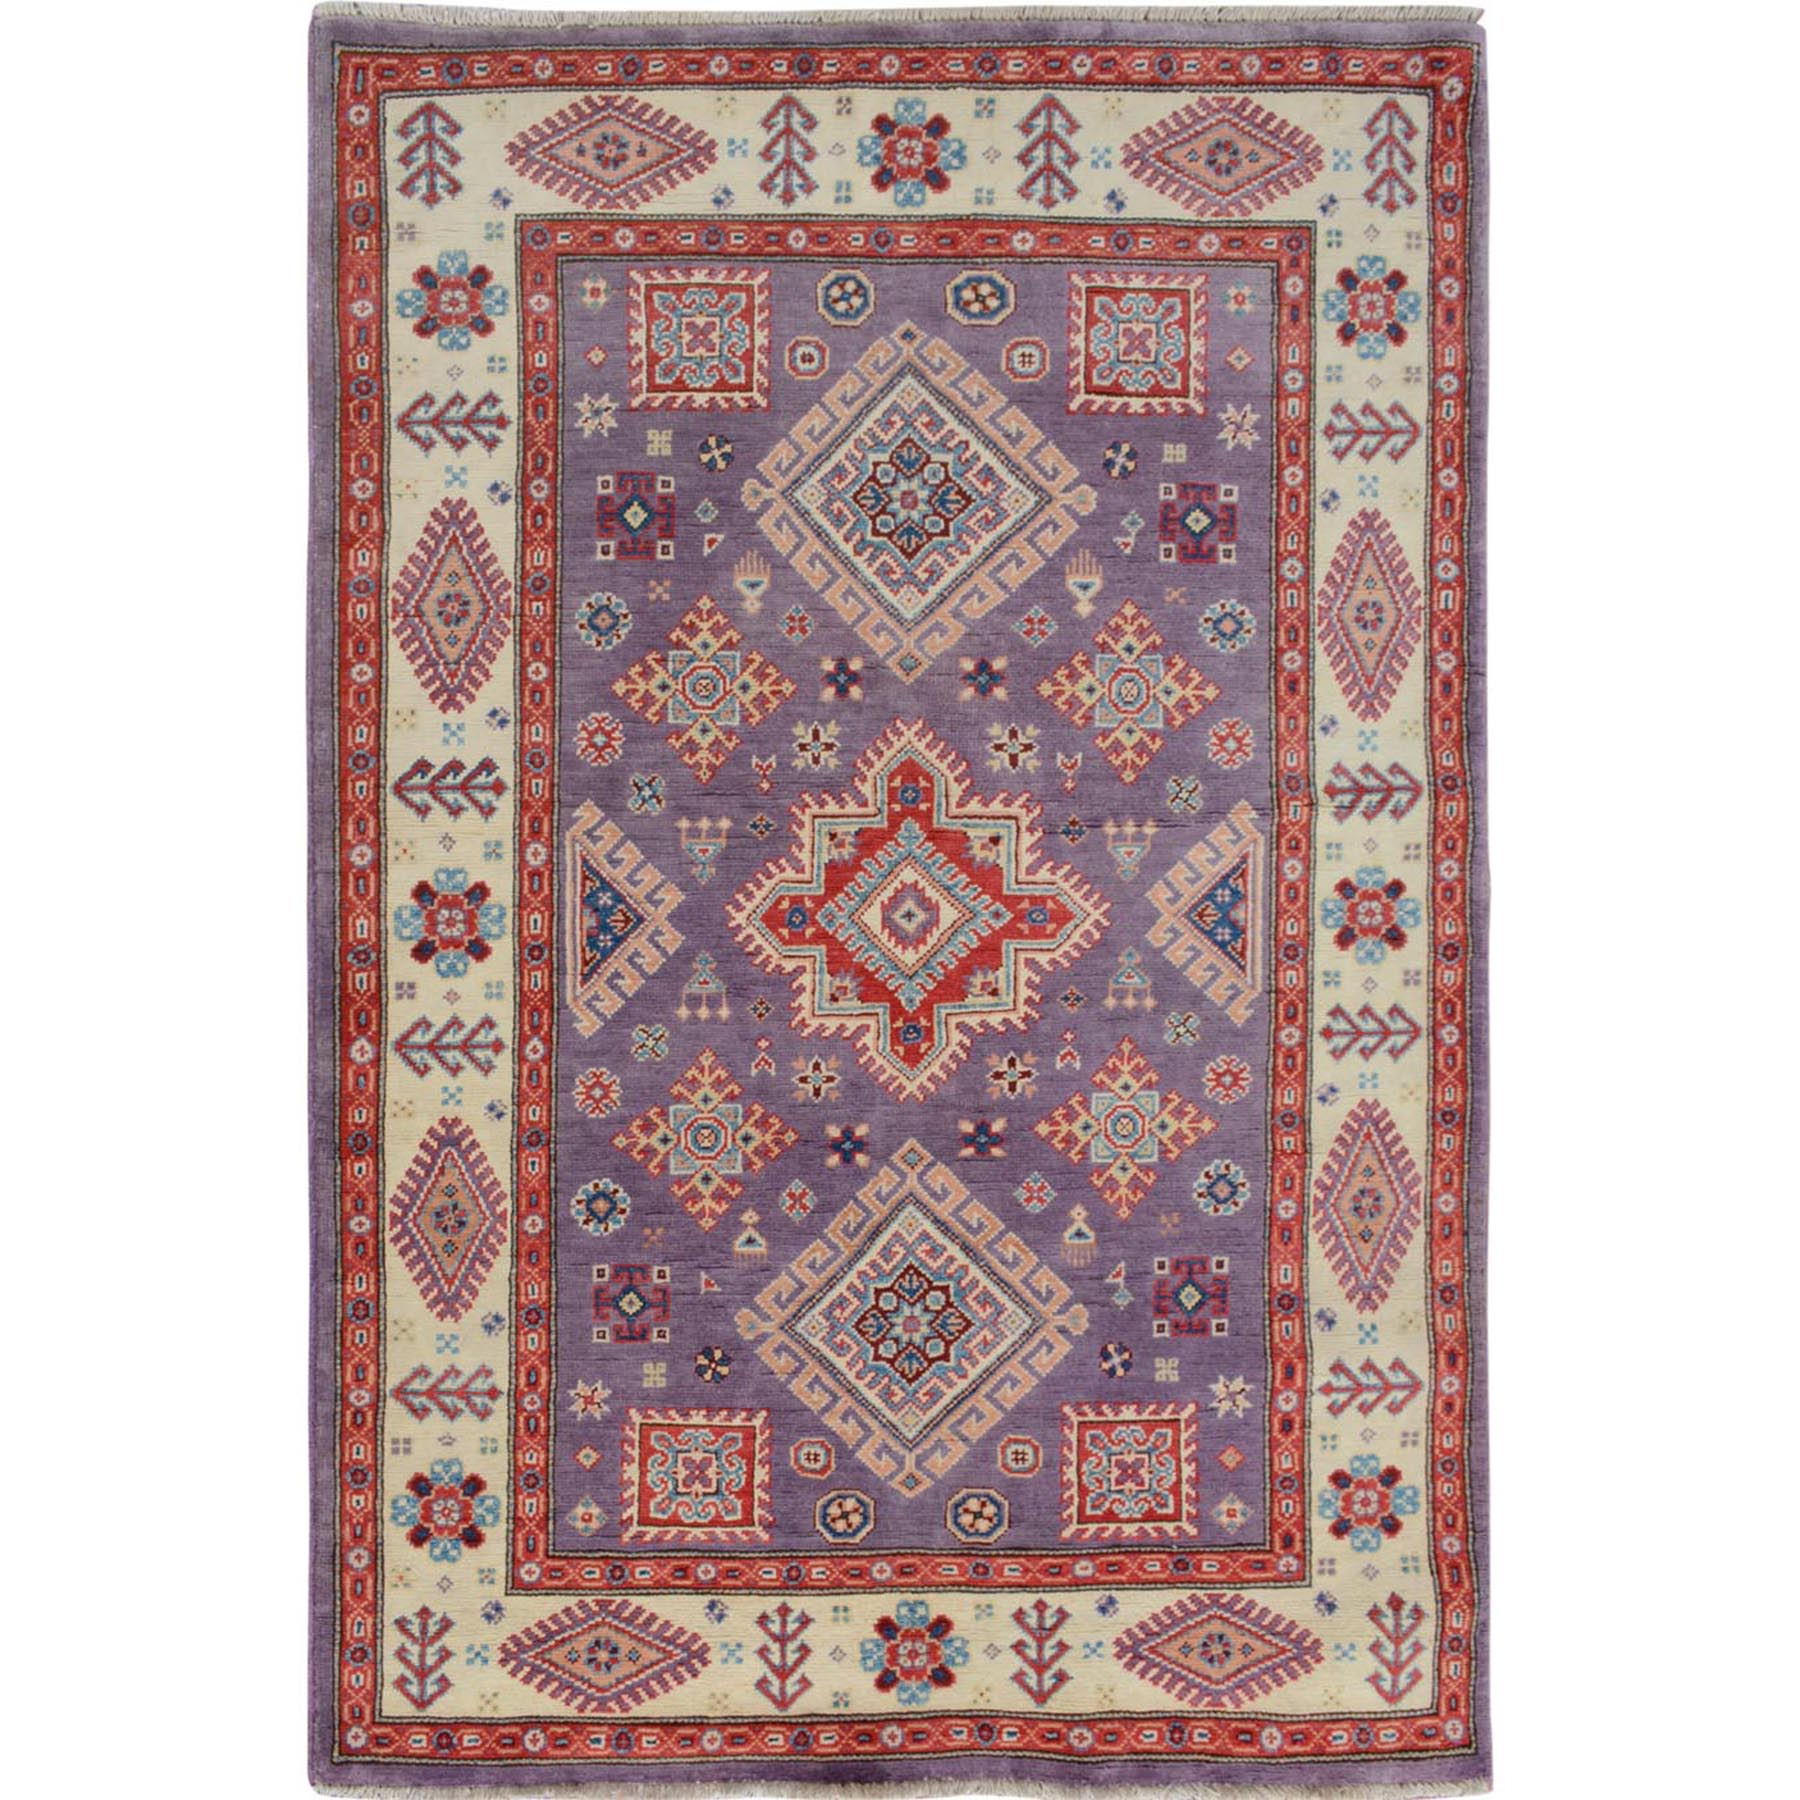 "4'X5'8"" Purple Special Kazak Geometric Design Pure Wool Hand Knotted Oriental Rug moae707d"